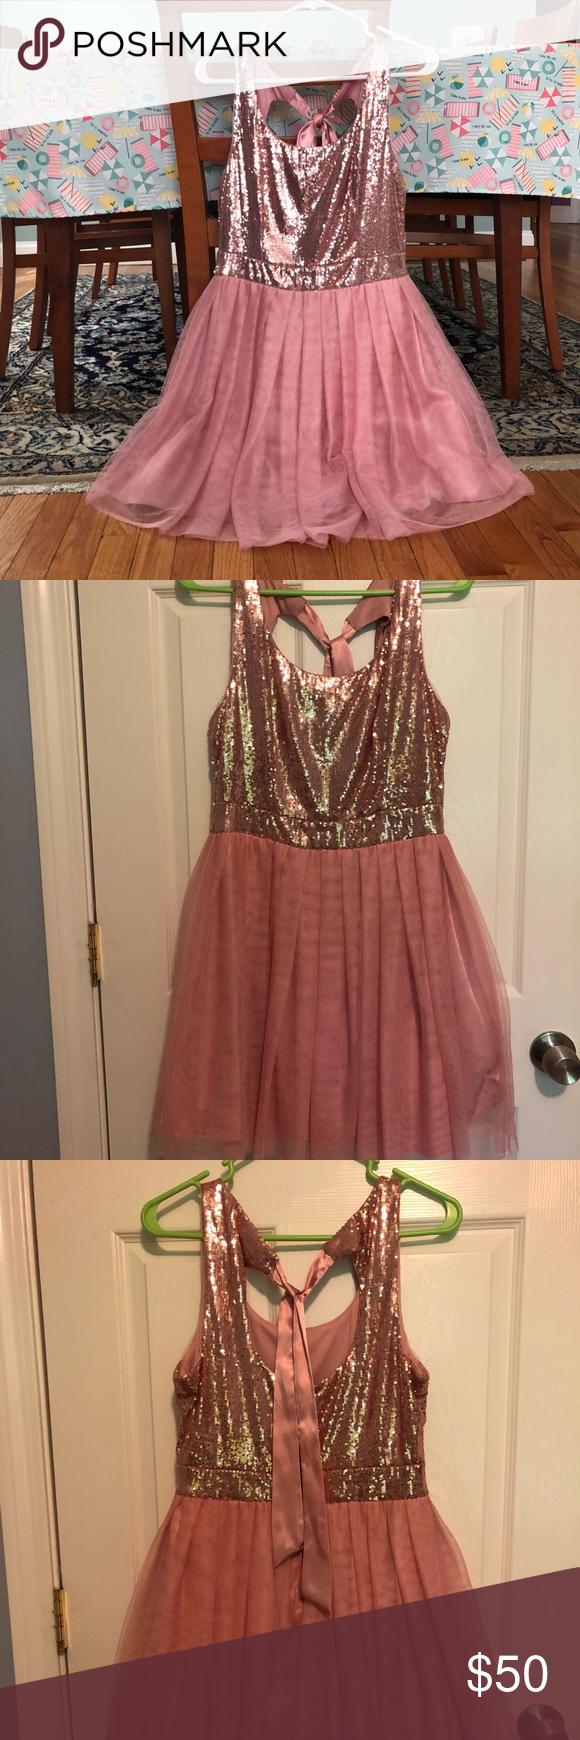 B darlin pink sequined aline homecoming dress my posh picks